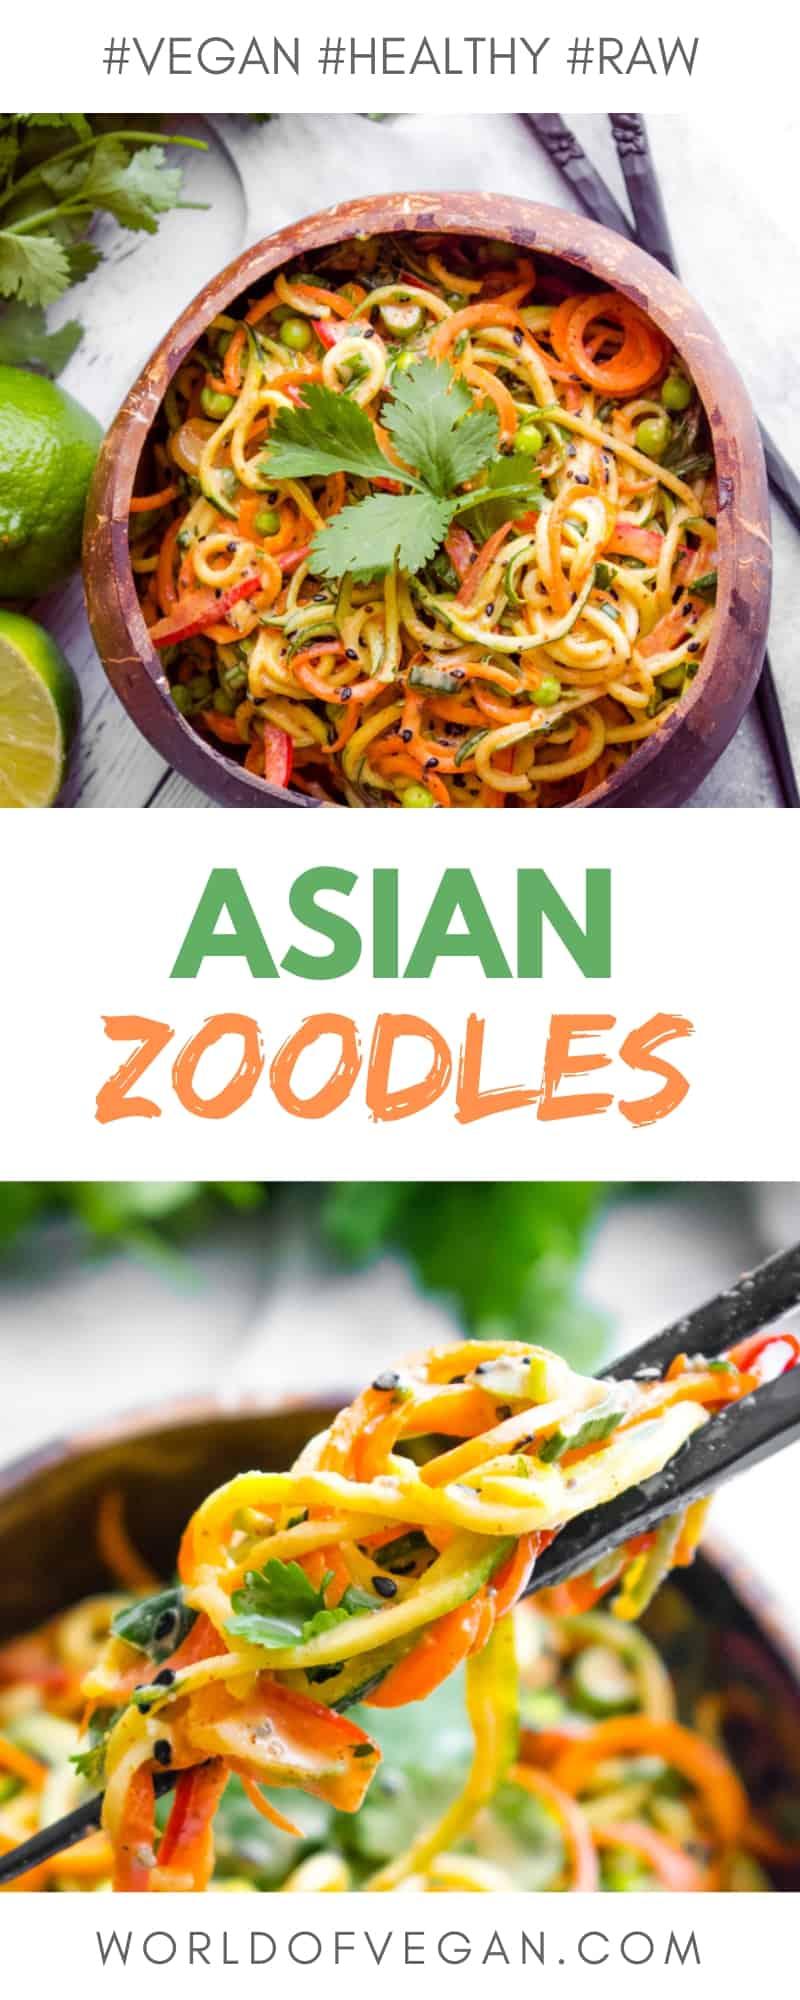 Asian-Style Zoodles | Healthy Veggie Noodle Salad | WorldofVegan.com | #vegan #raw #zoodles #zucchini #healthy #recipe #vegan #vegetarian #worldofvegan